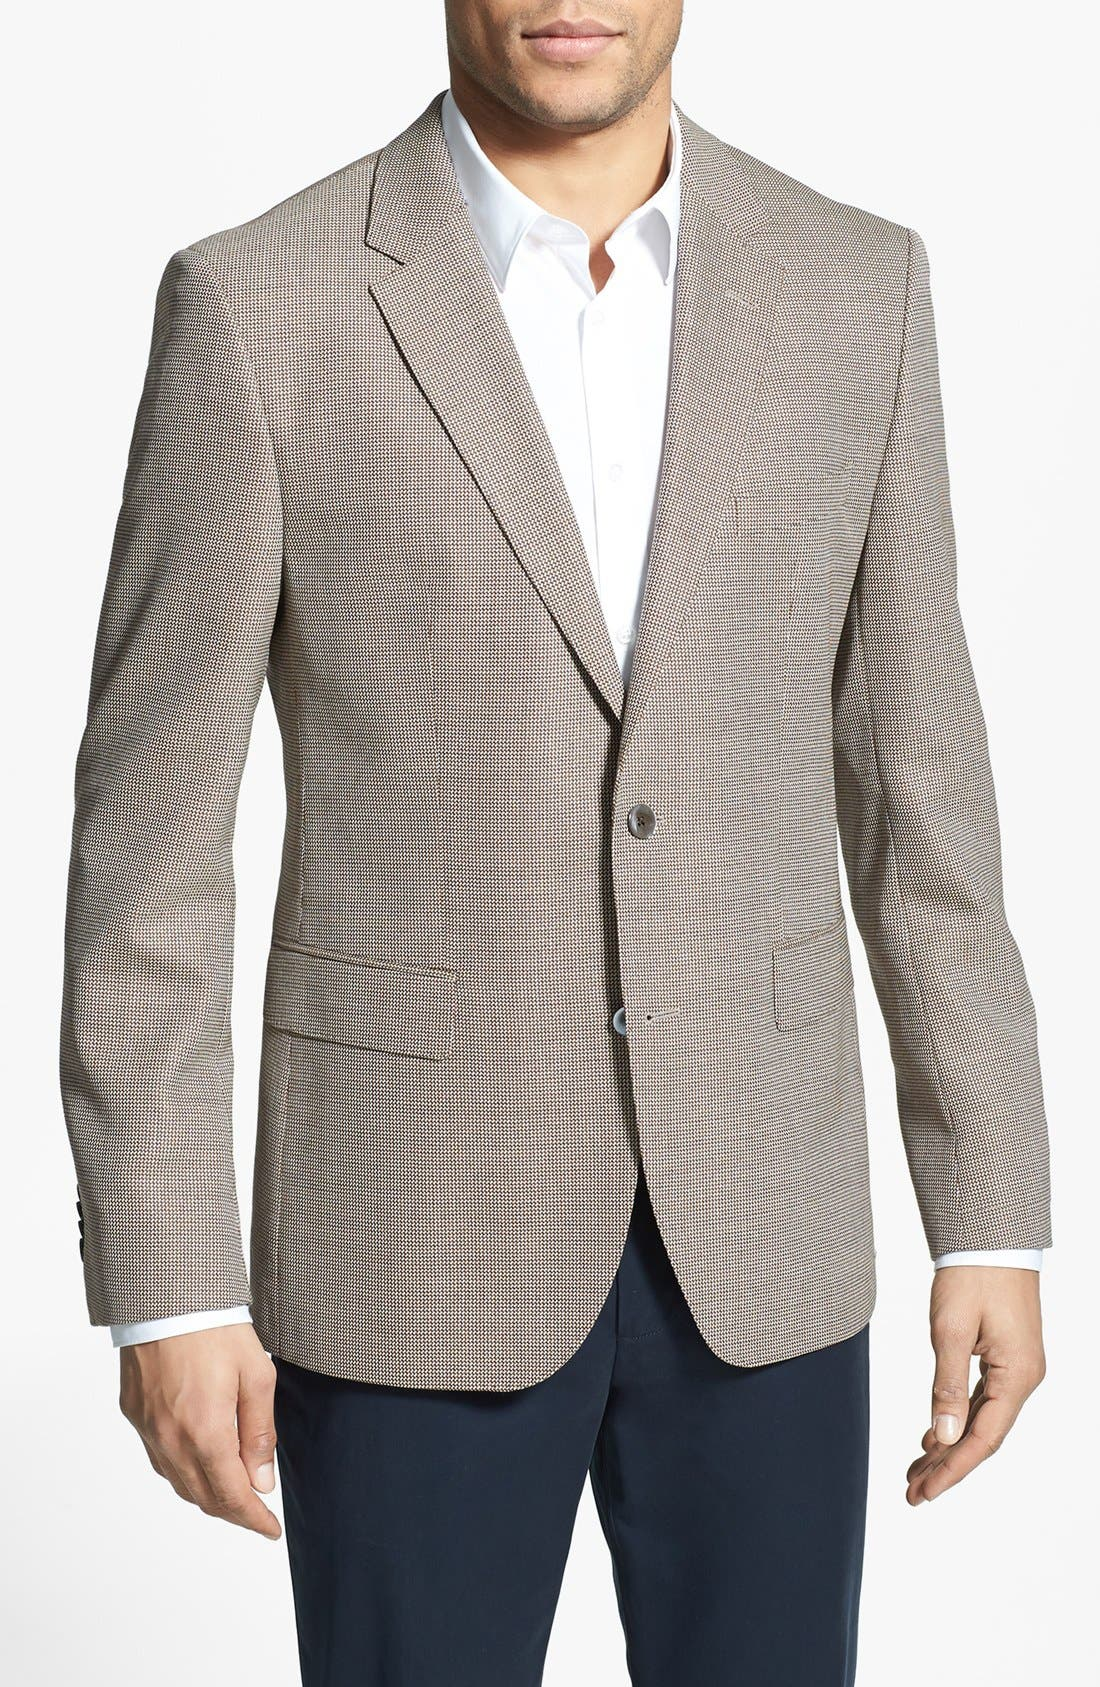 Alternate Image 1 Selected - BOSS HUGO BOSS 'Jarrett' Trim Fit Wool Sportcoat